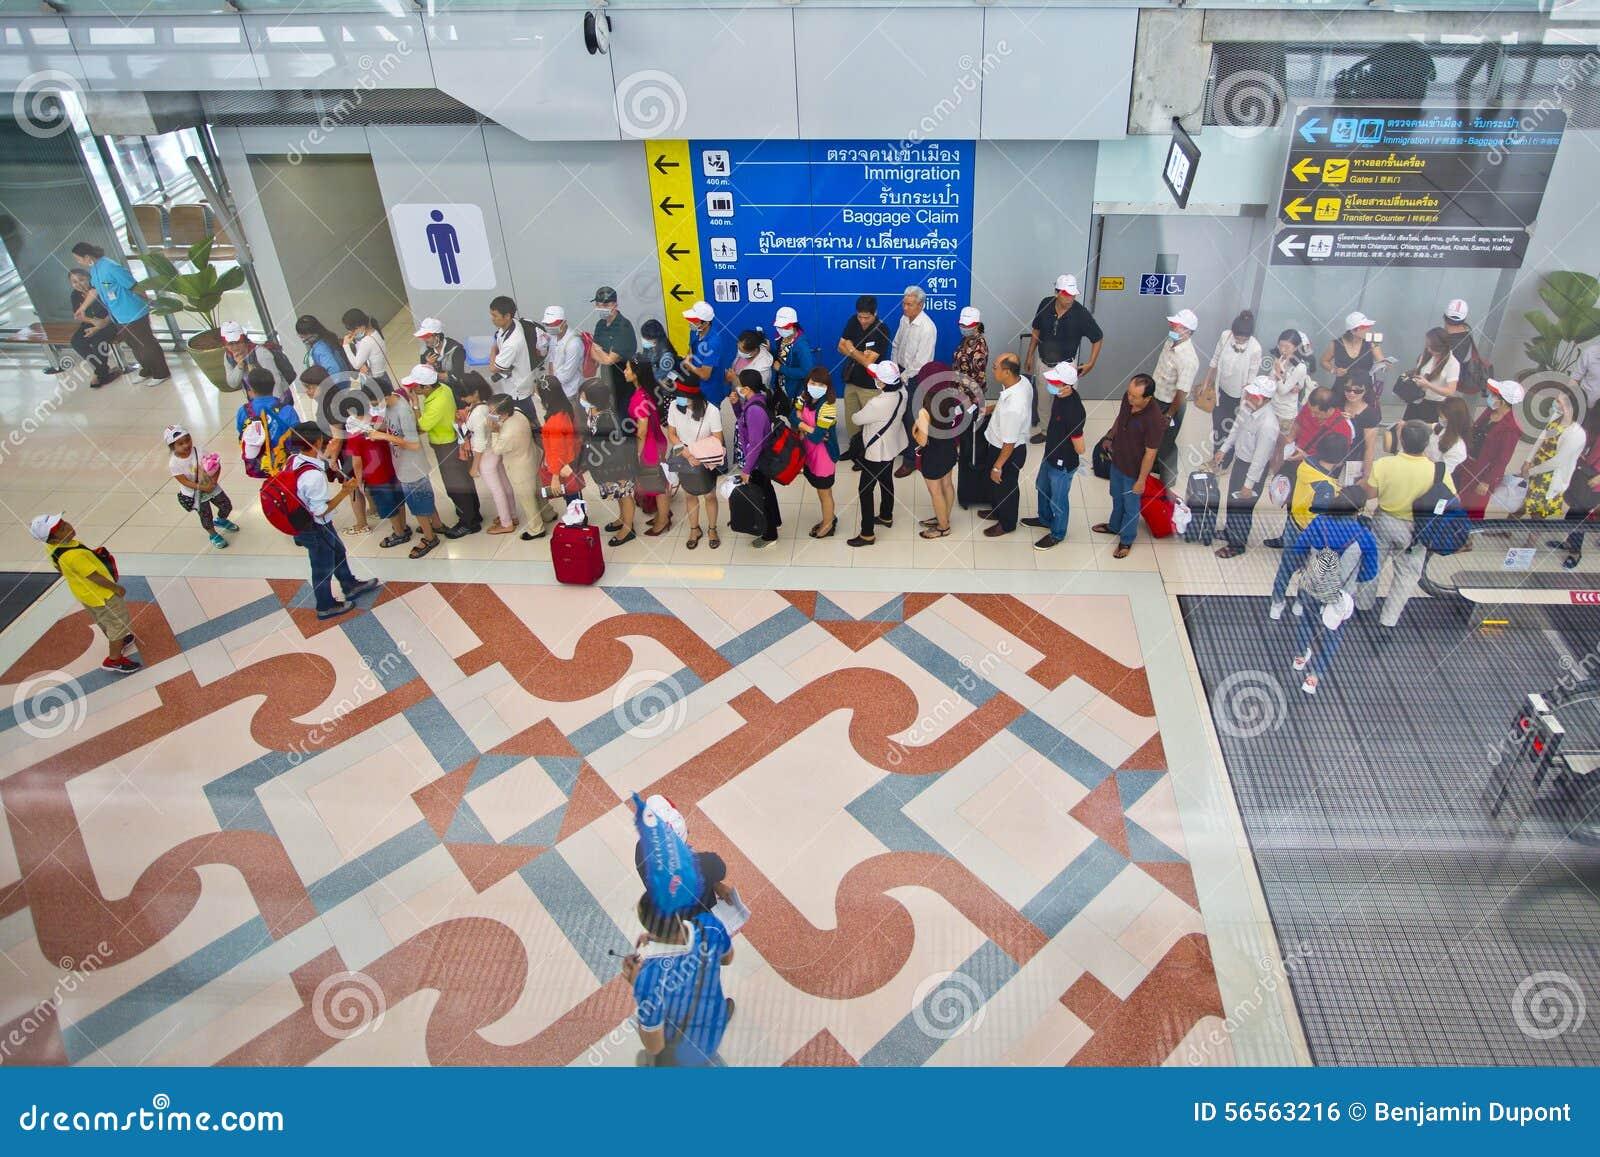 Download Άνθρωποι που περιμένουν στη σειρά στον αερολιμένα Εκδοτική Εικόνες - εικόνα από ασία, άφιξης: 56563216